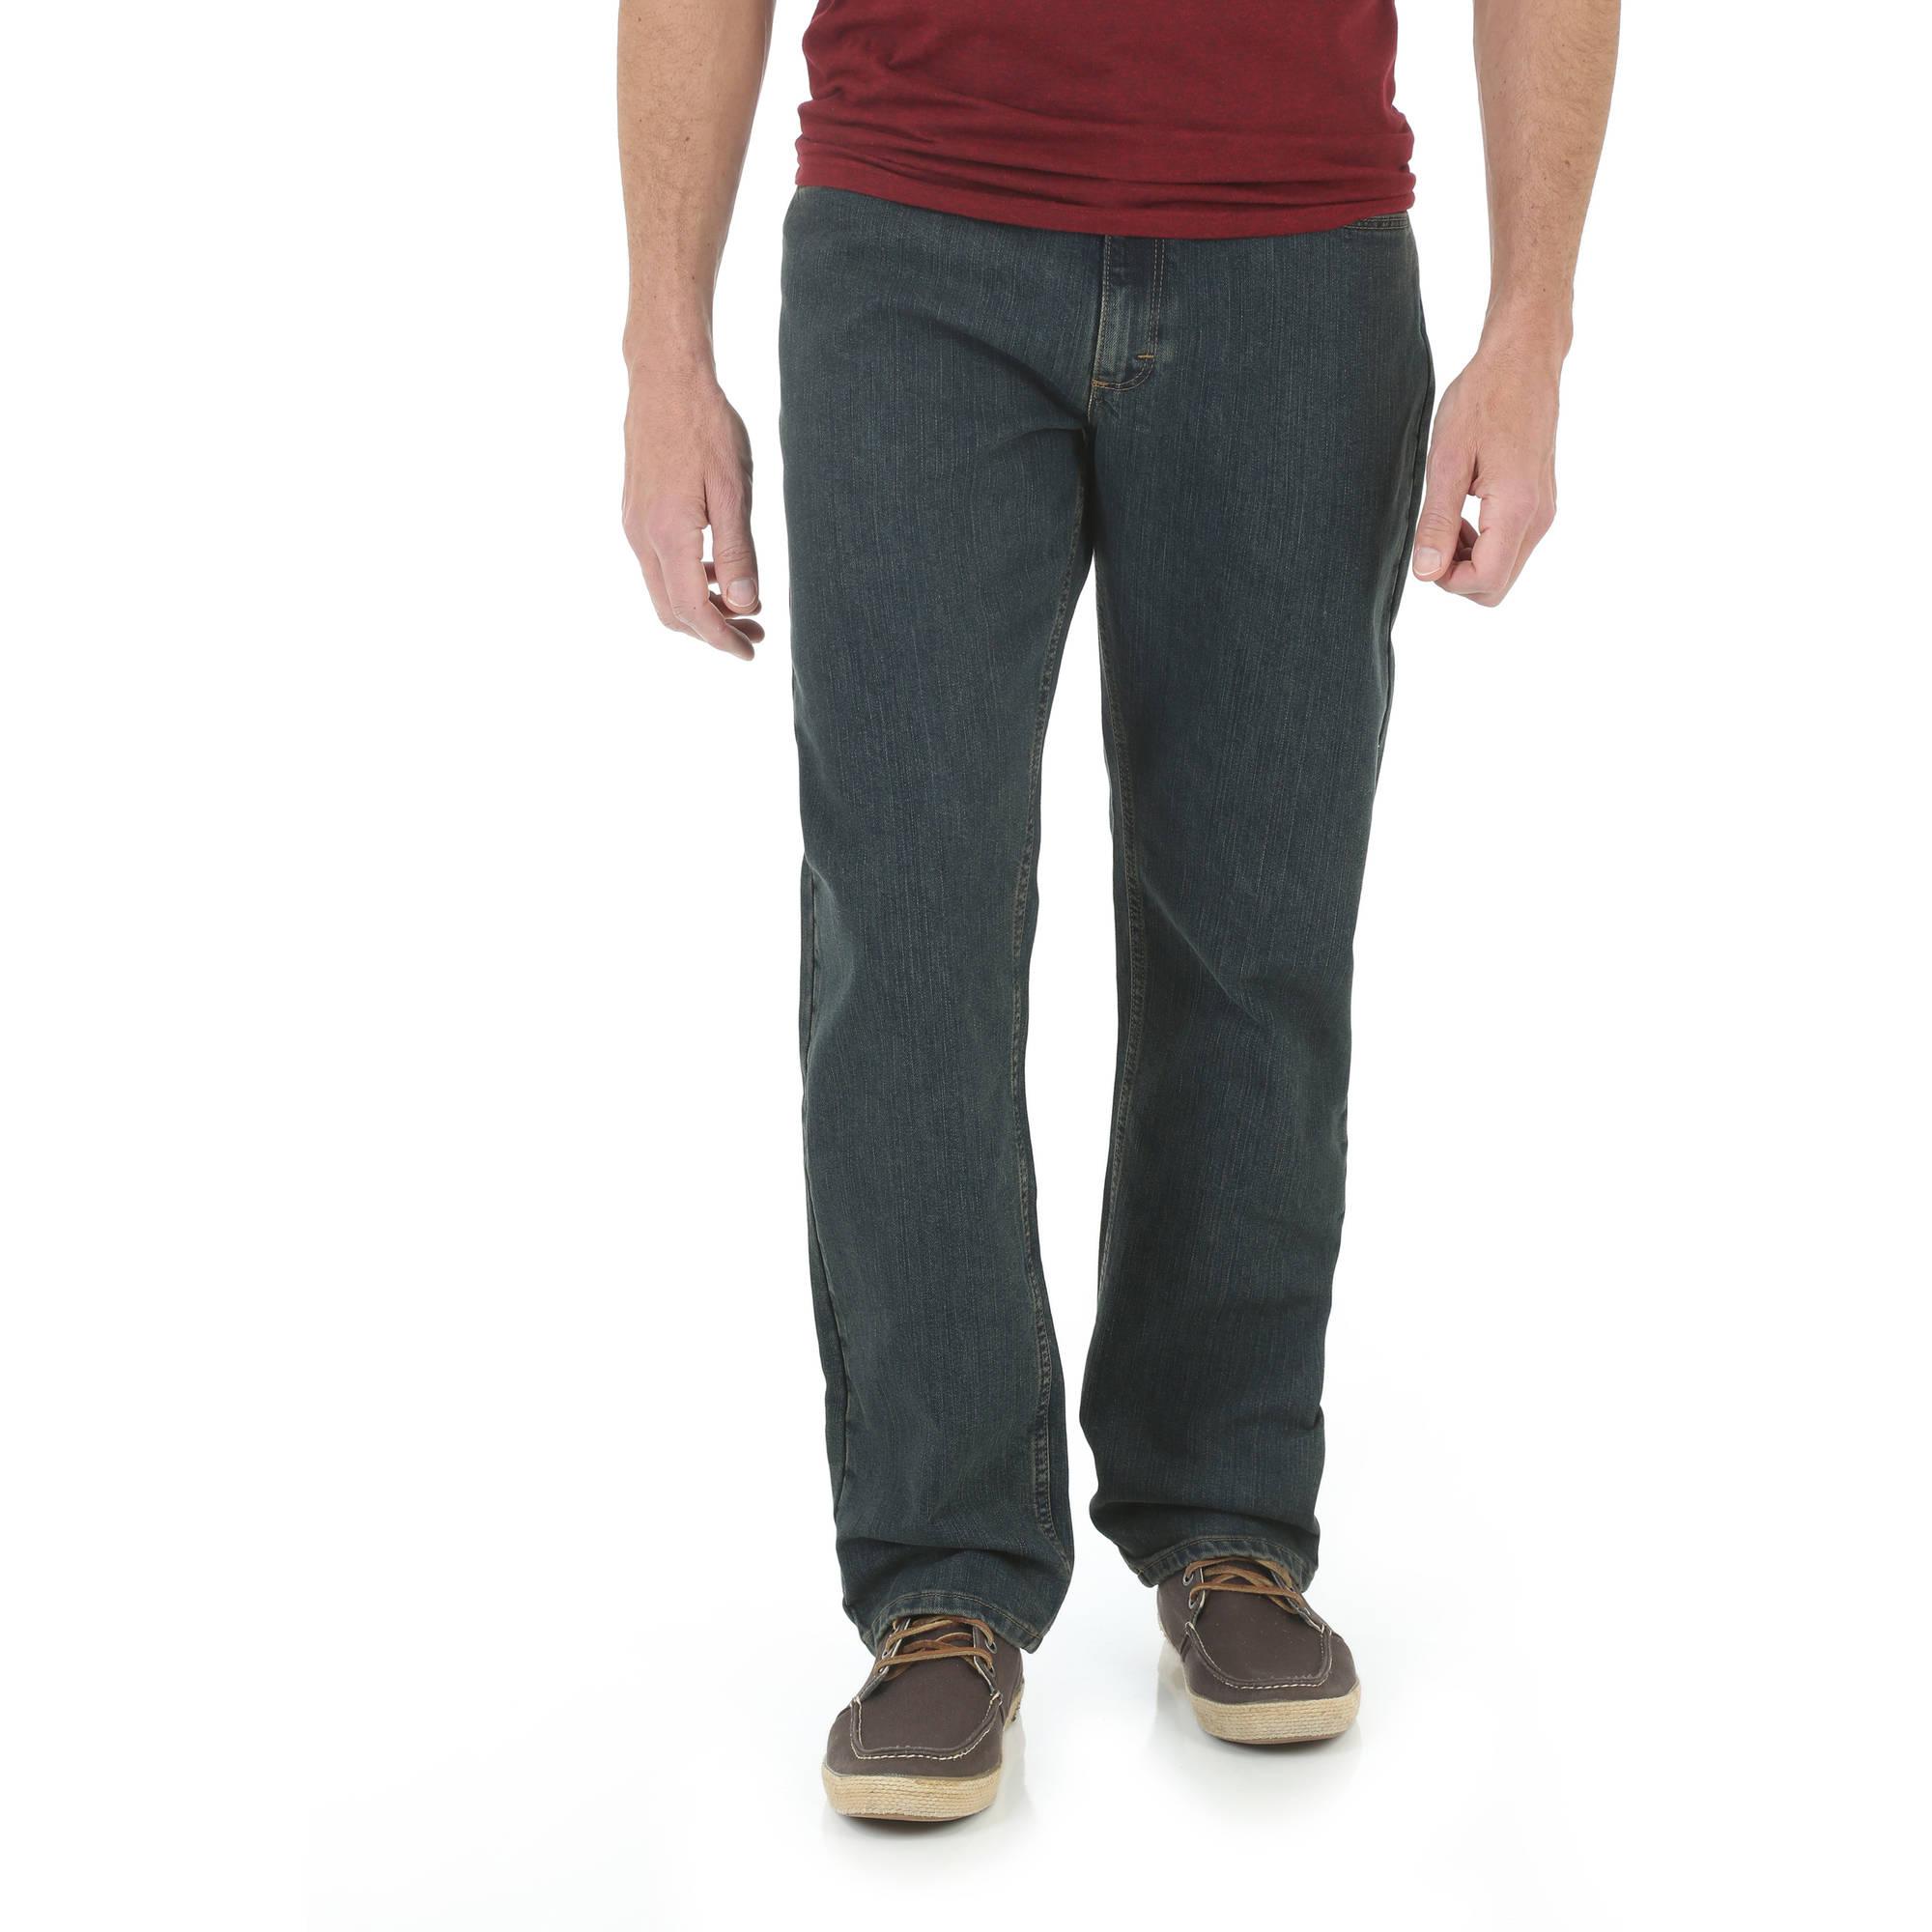 Wrangler Men's Advanced Comfort Breathe-Dri Wicking Relaxed Fit Flex Jean